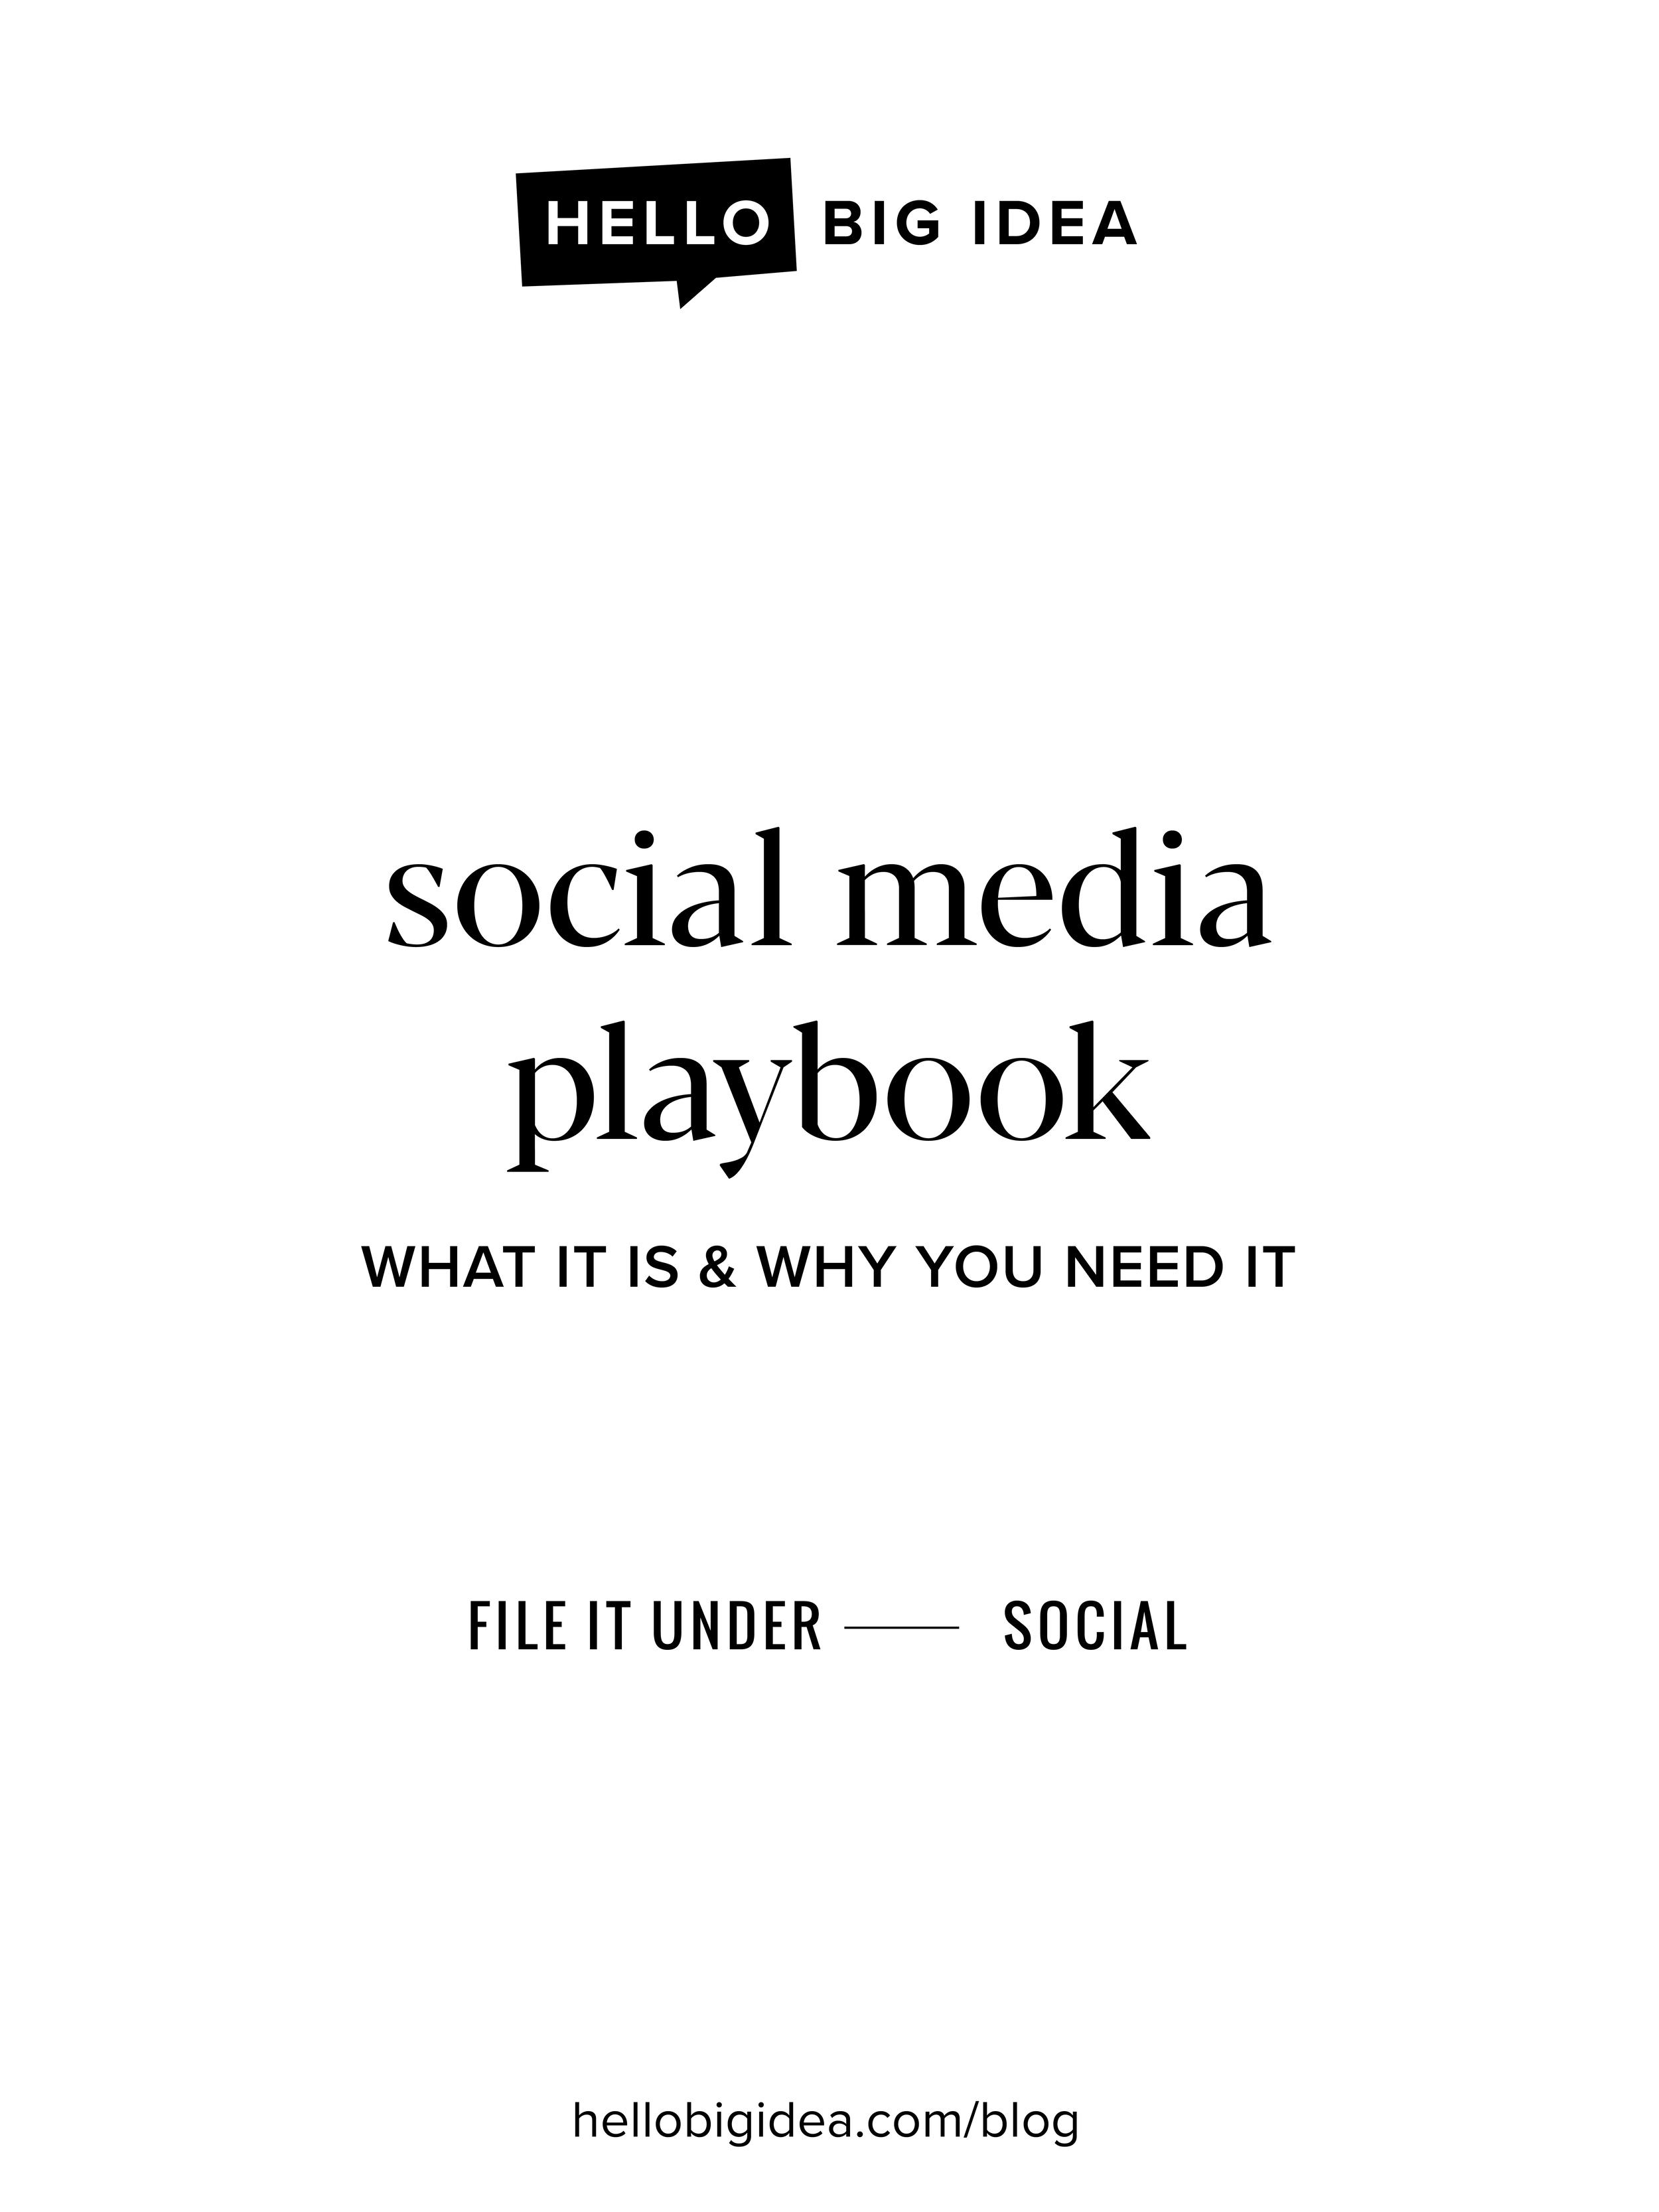 socialmediaplaybook-blogshare-08.png